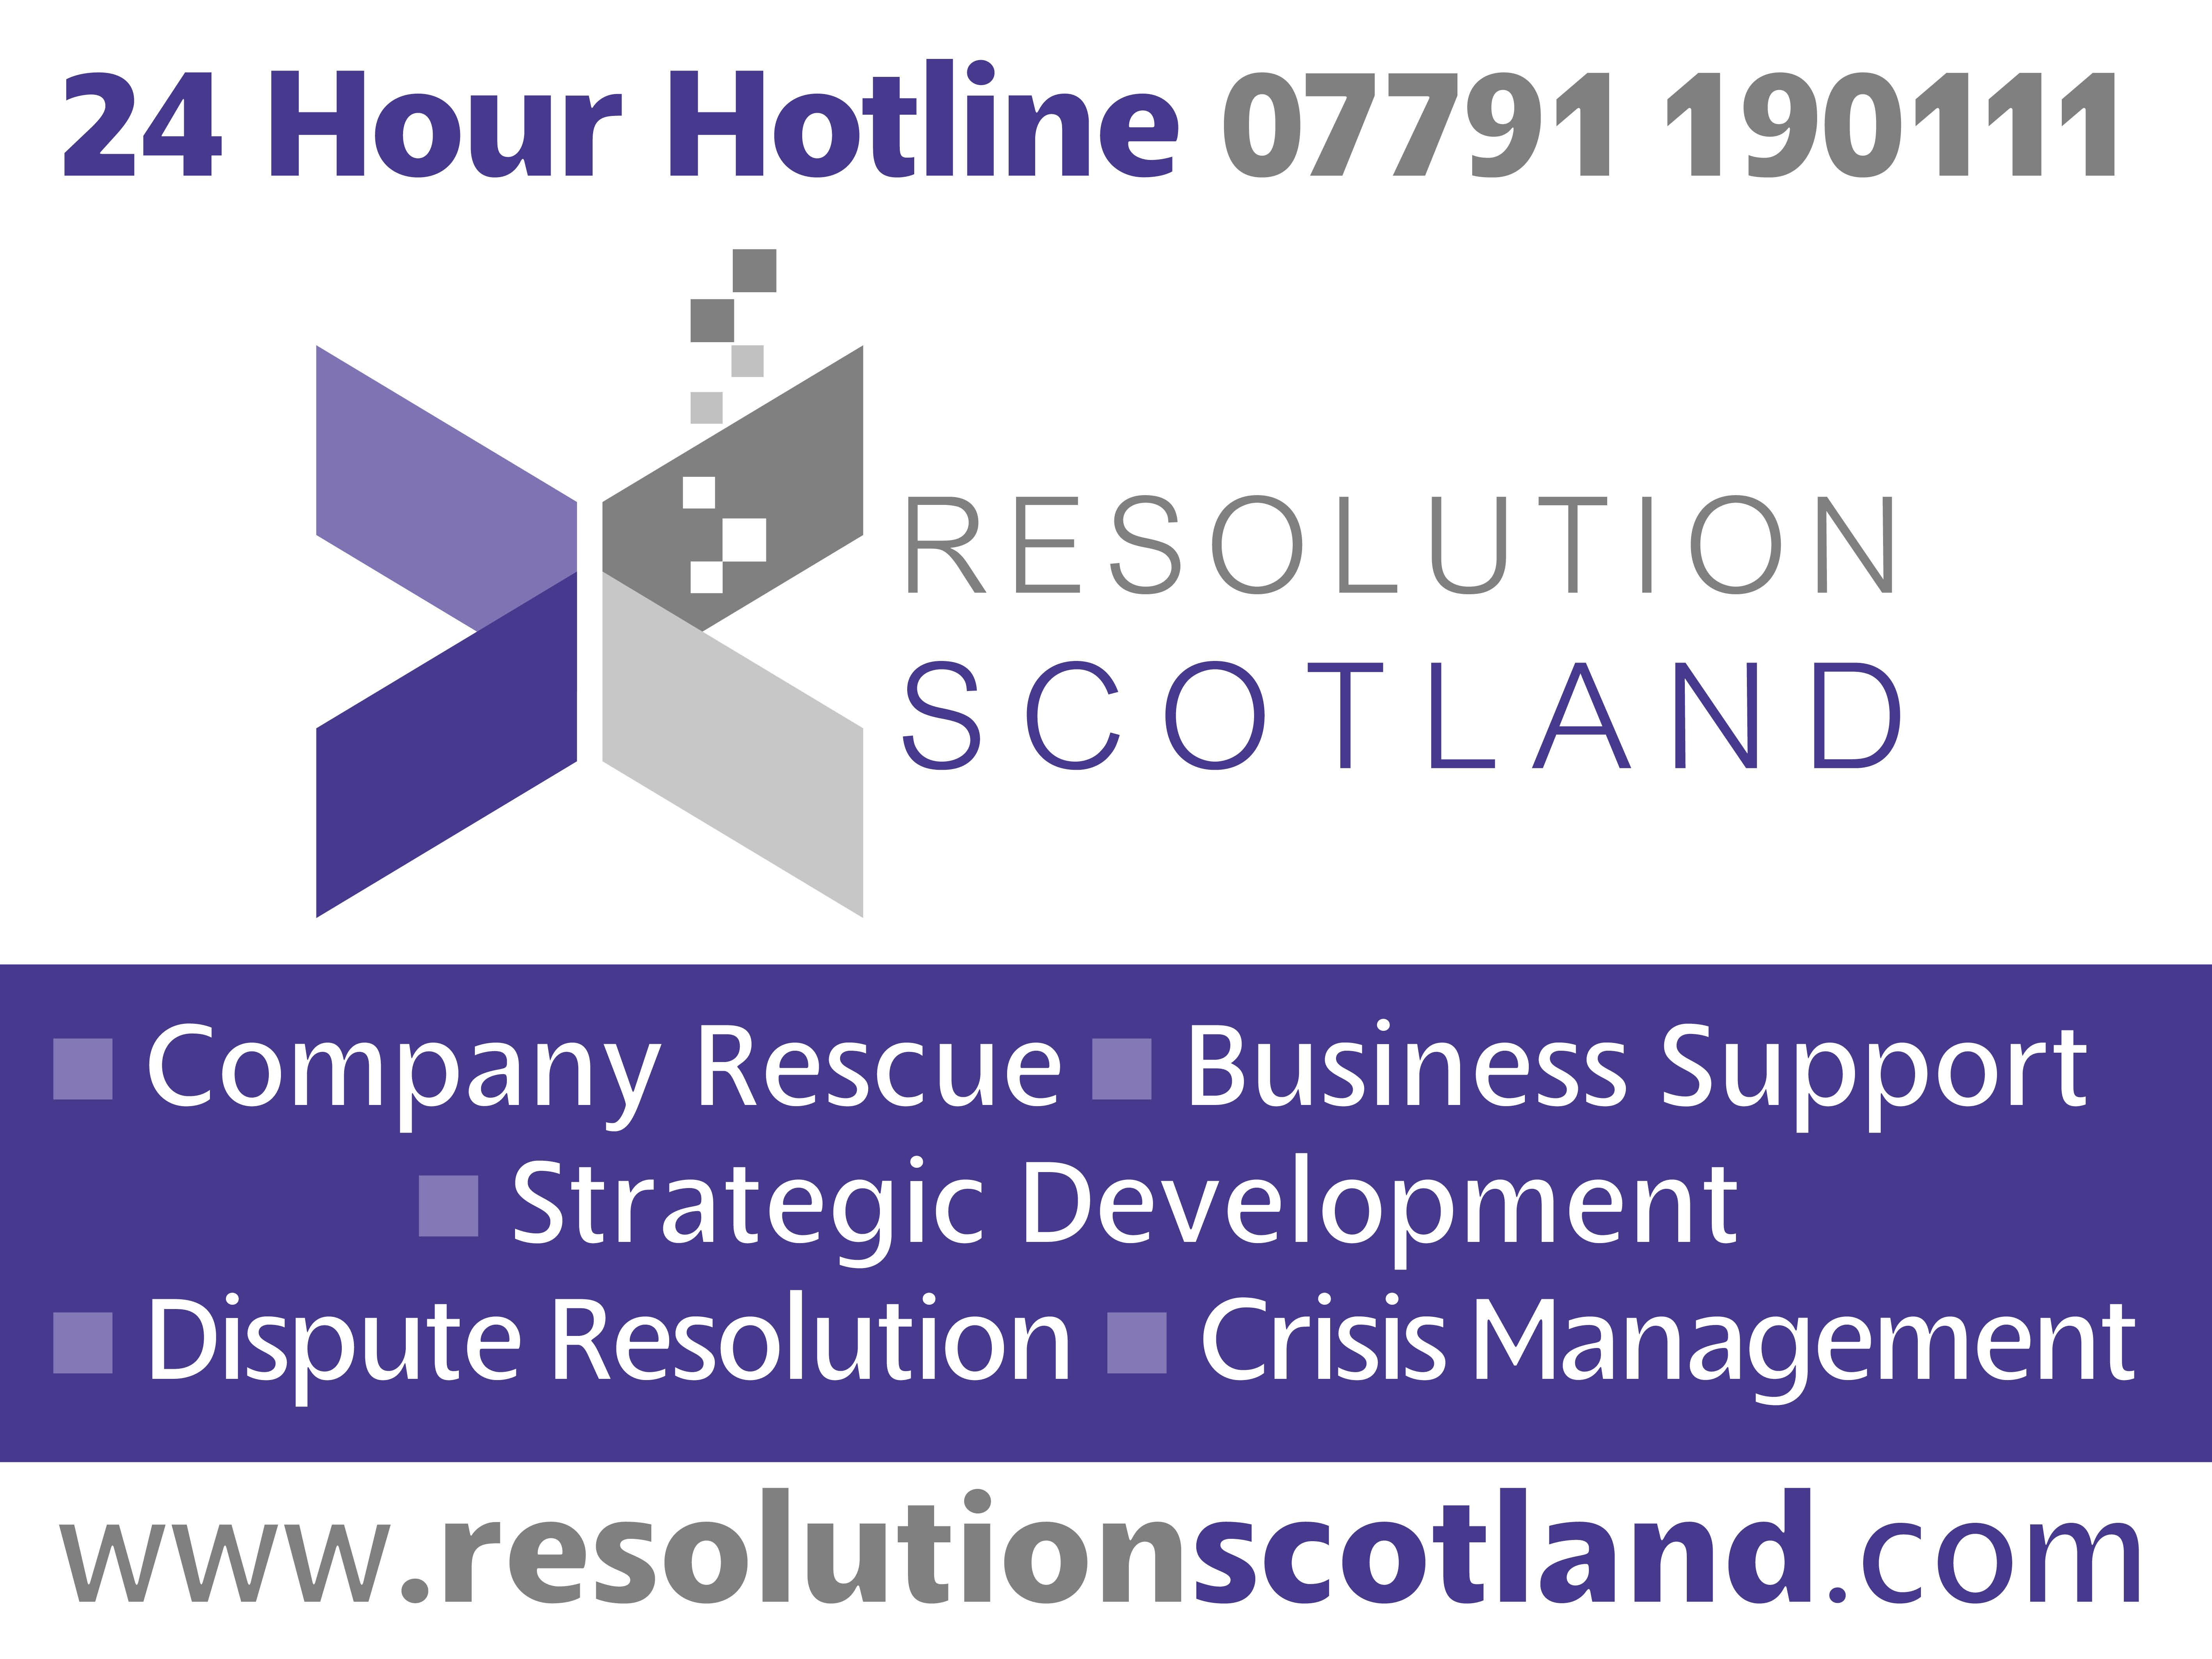 Resolution Scotland